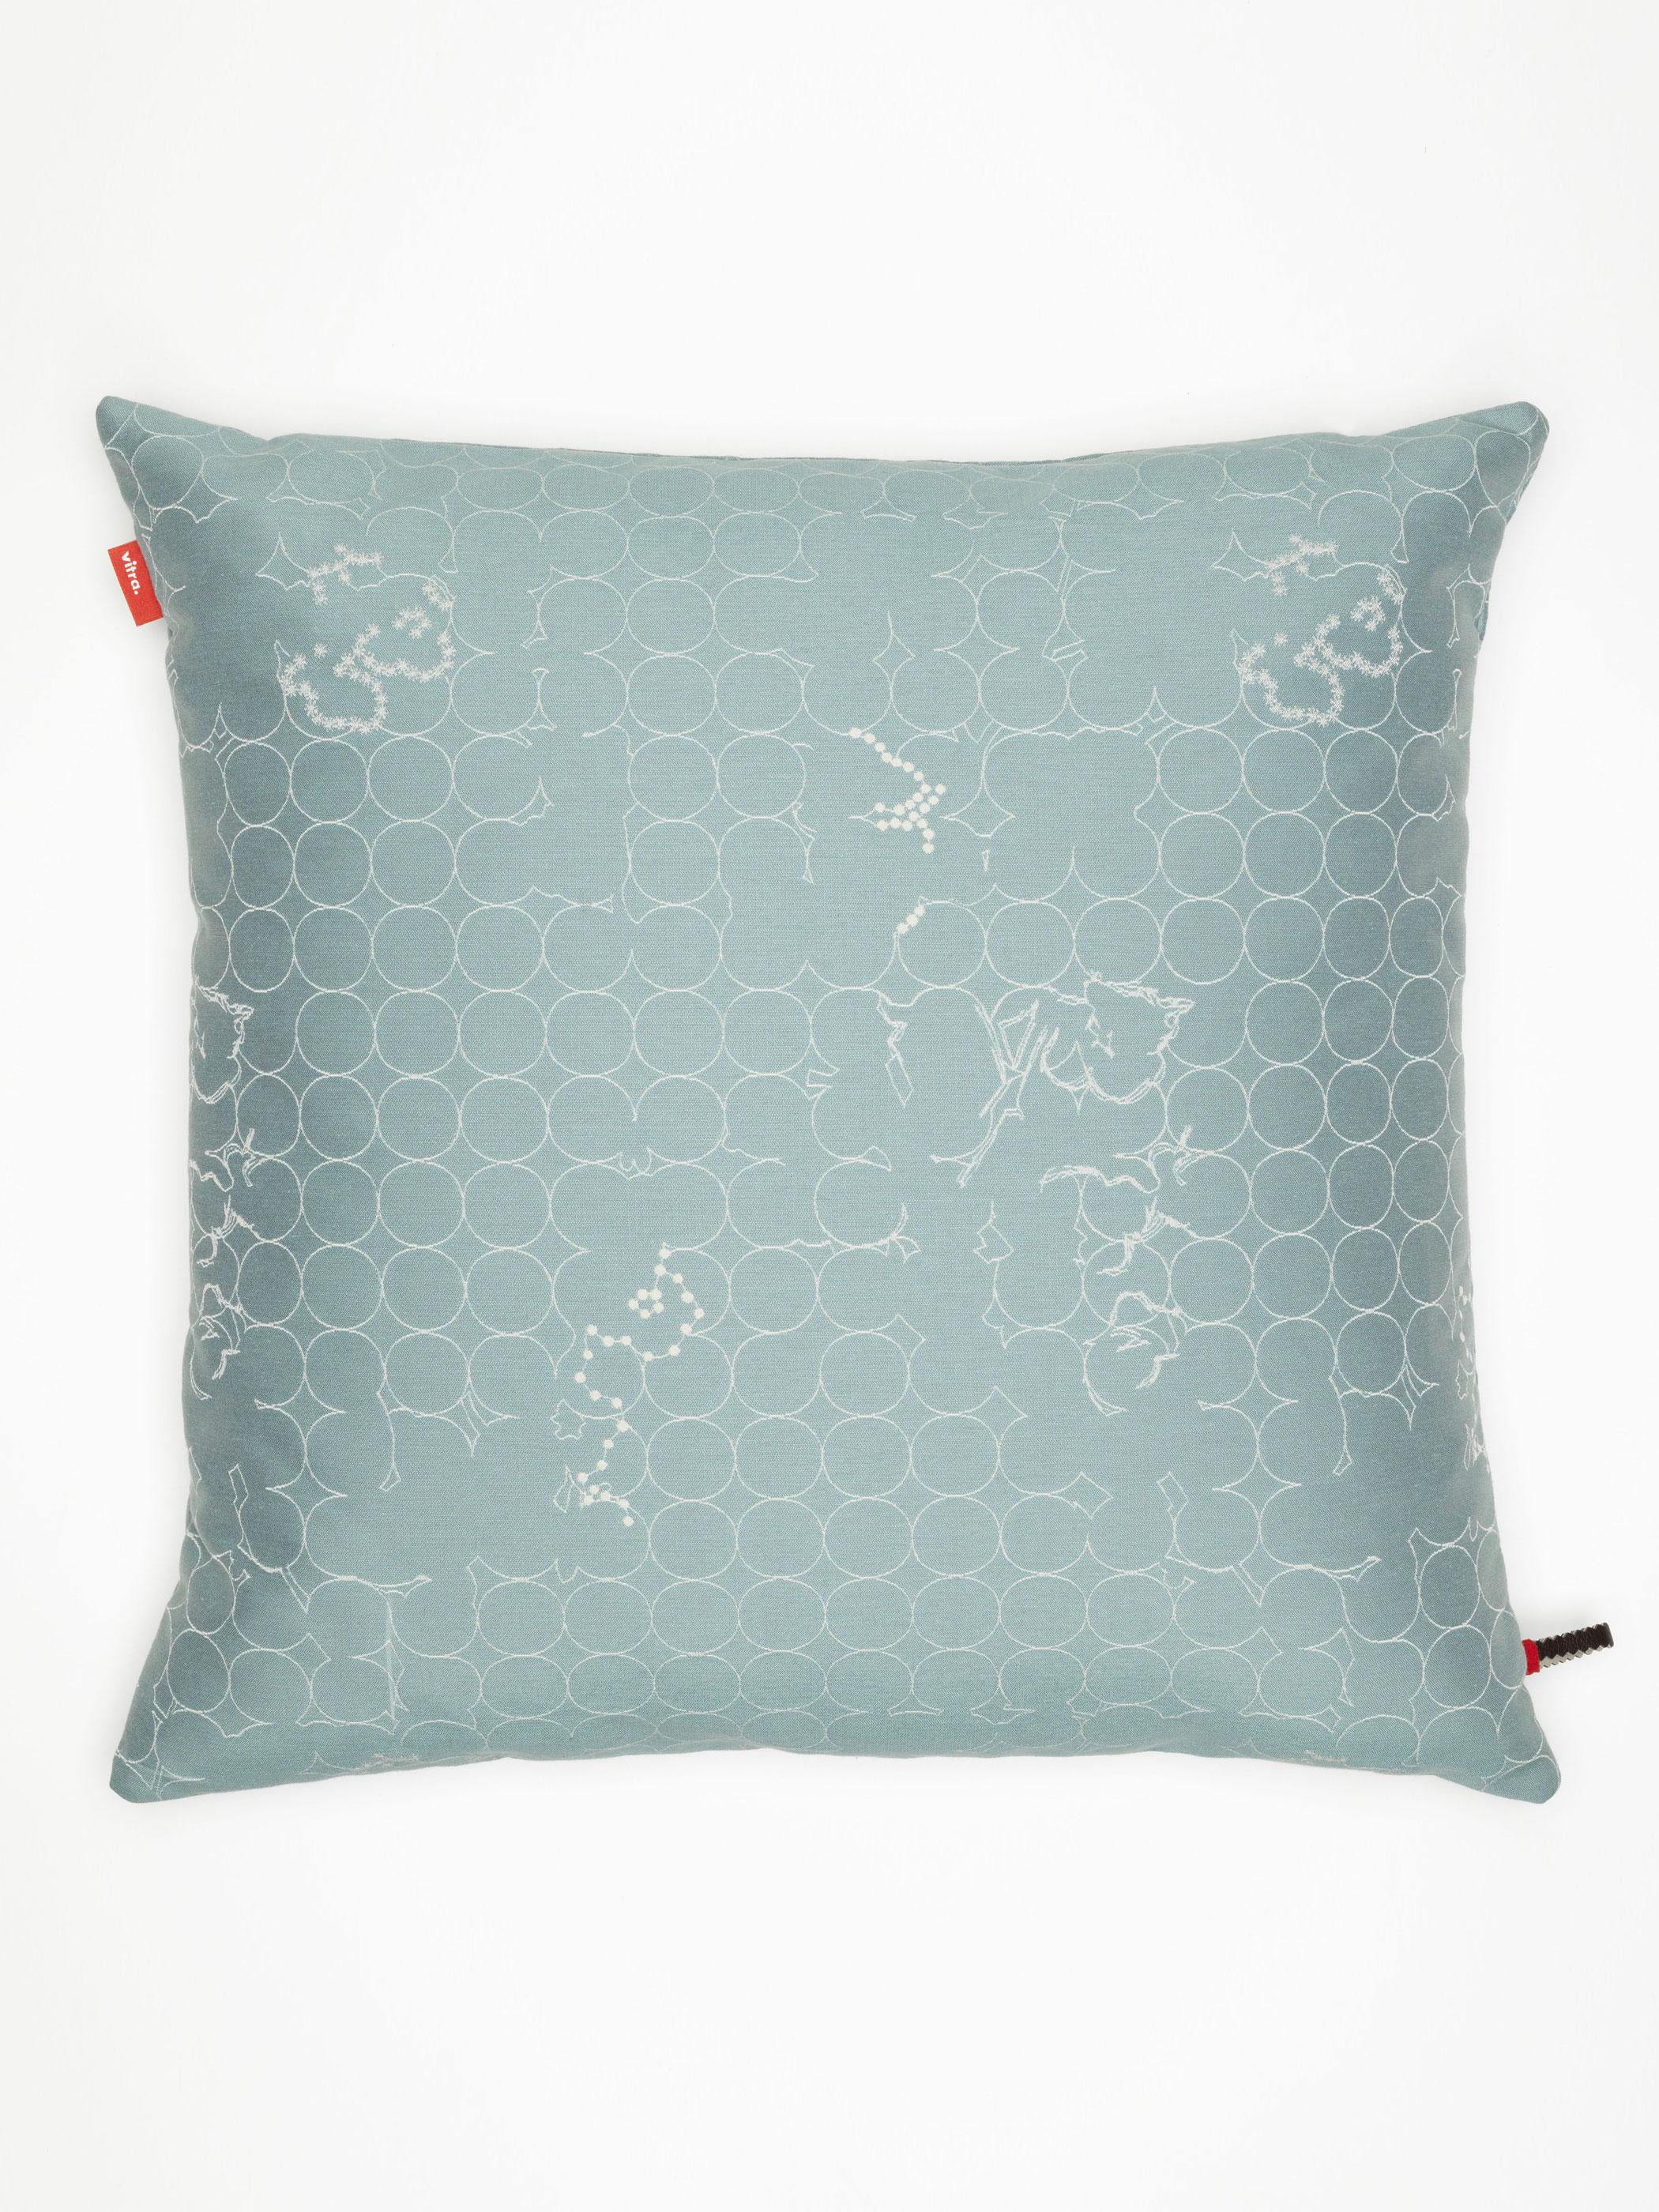 vitra kissen maharam vineyard woven cay produktdetails. Black Bedroom Furniture Sets. Home Design Ideas